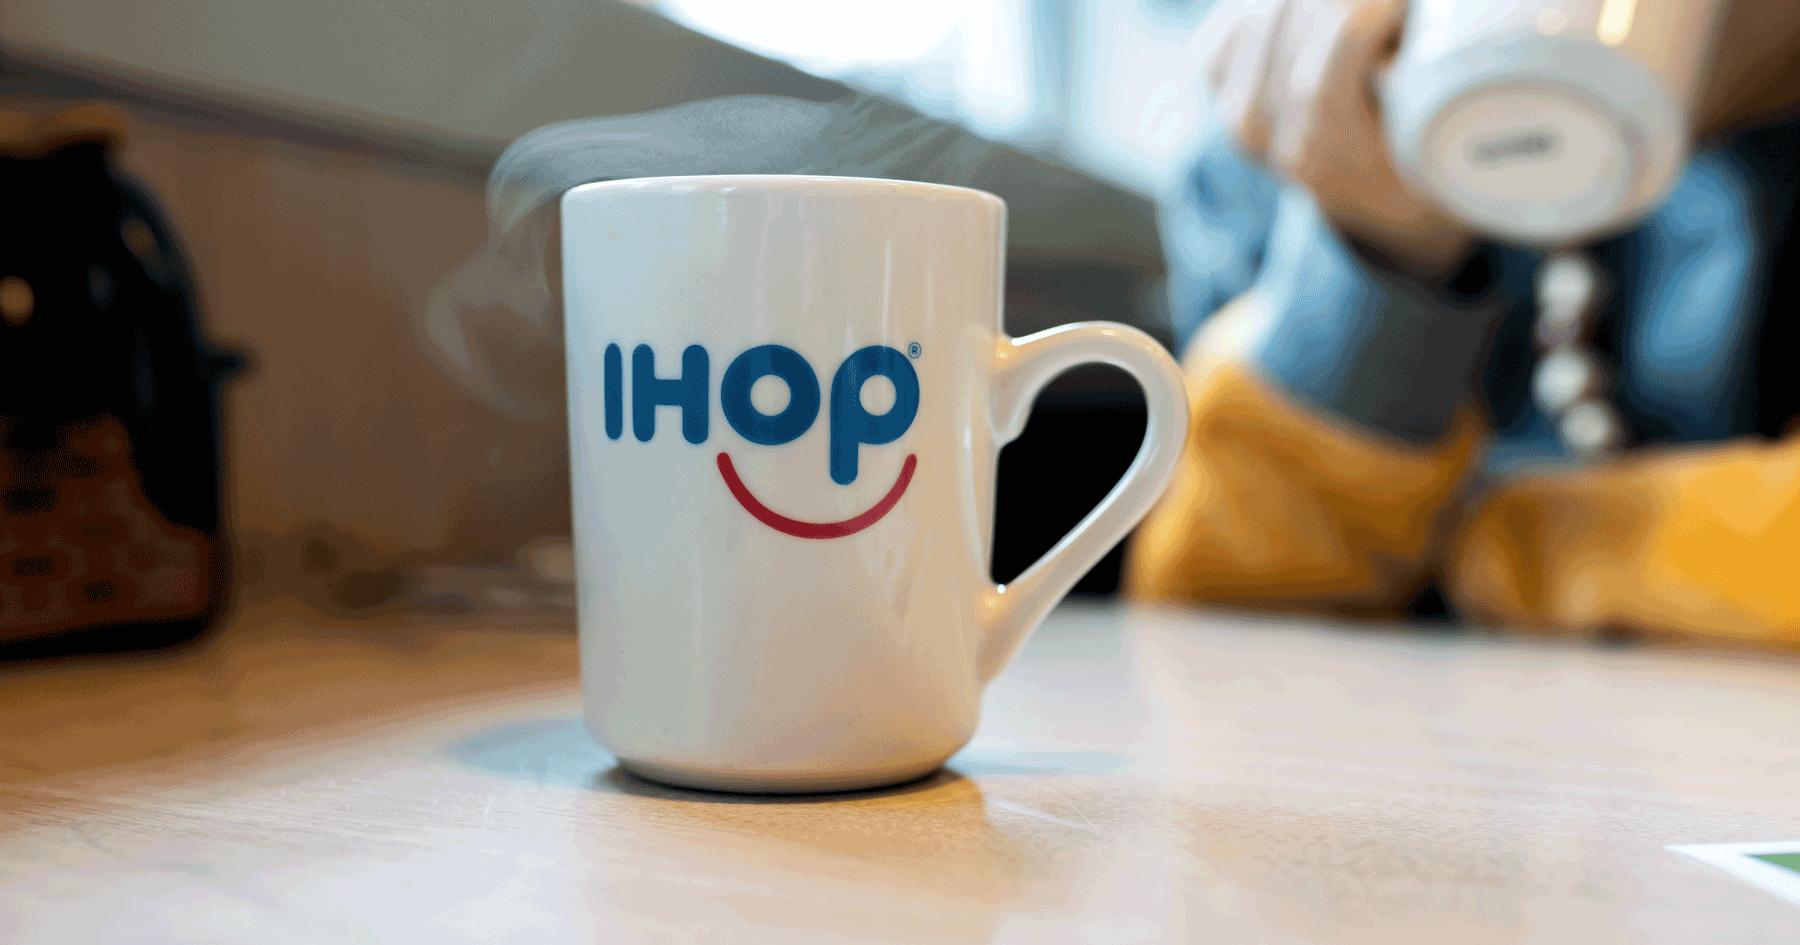 IHOP and Applebee's will permanently close more restaurants